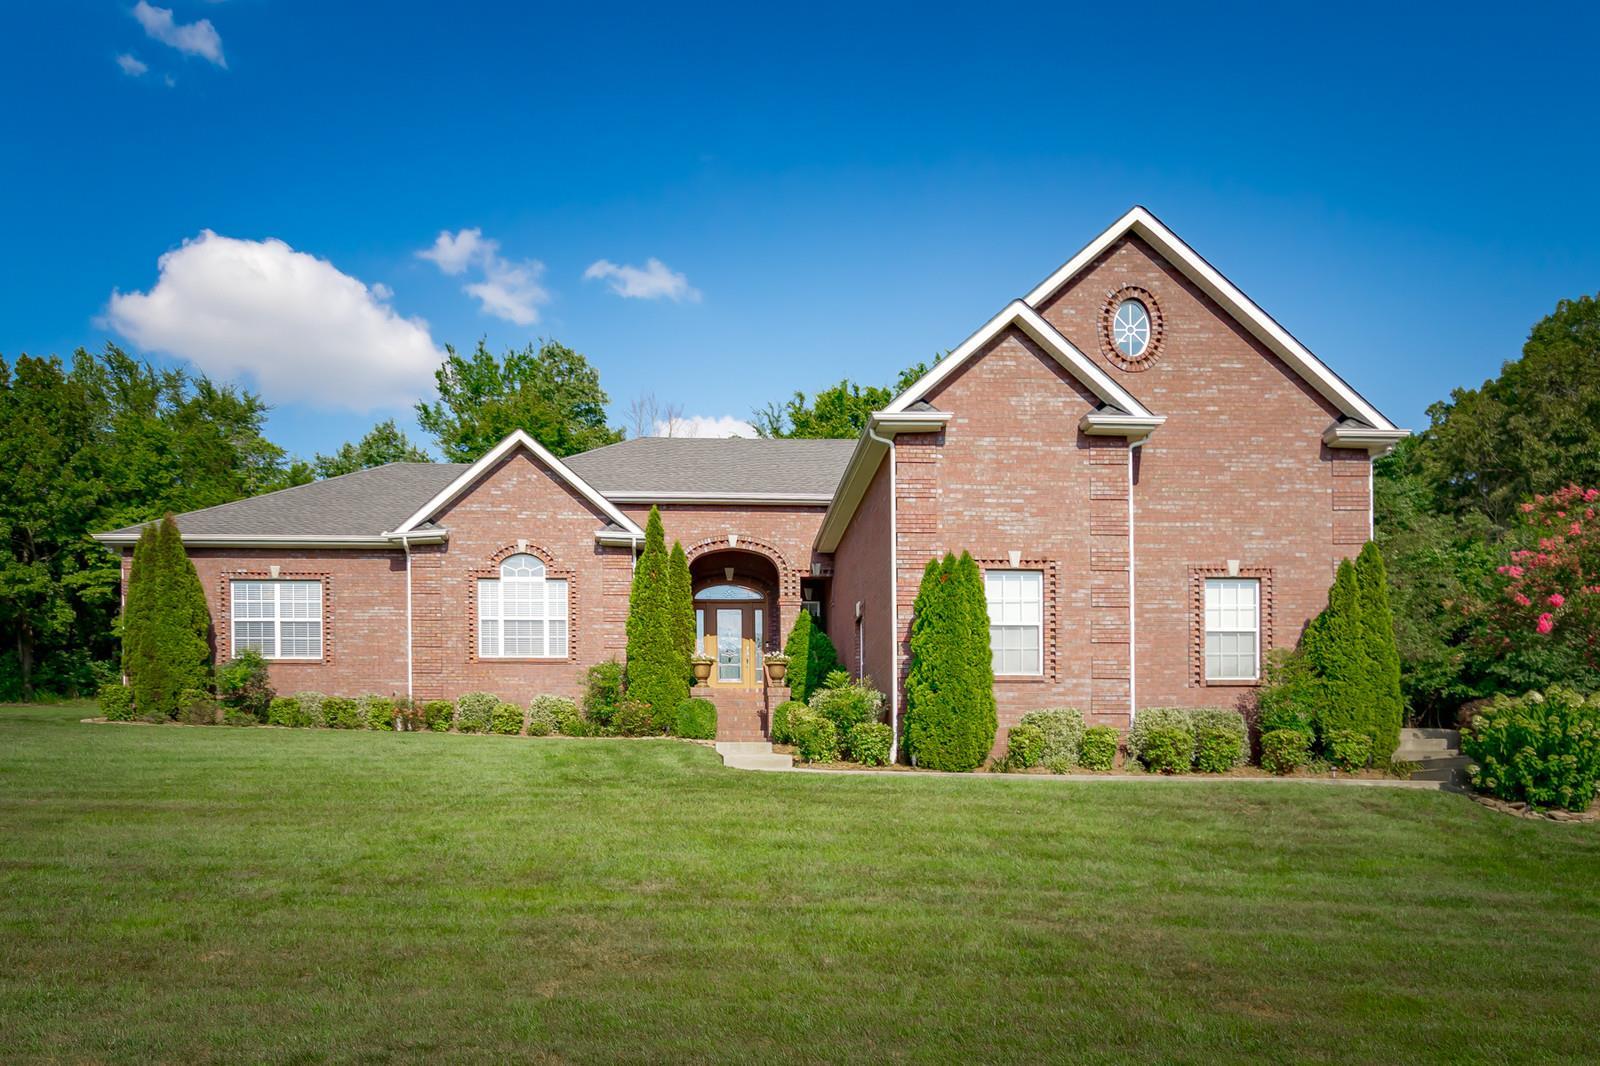 1990 Mossy Oak Cir, Clarksville, TN 37043 - Clarksville, TN real estate listing